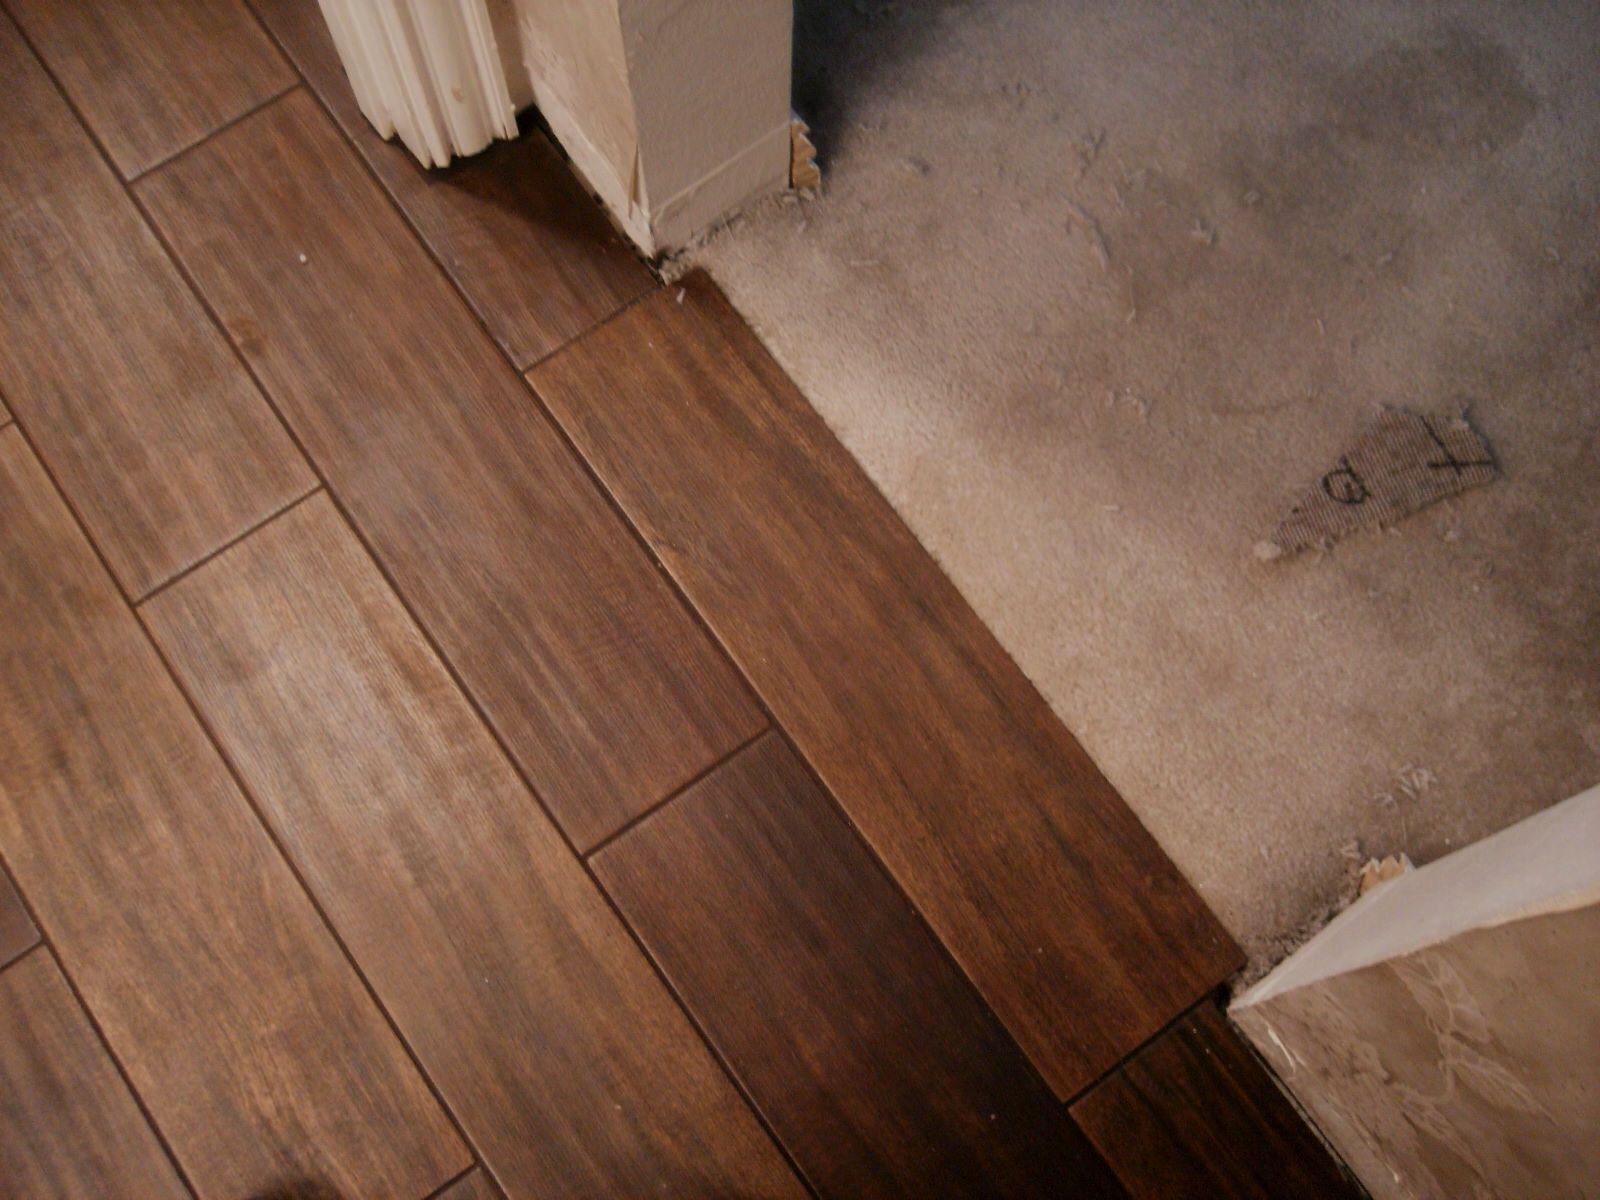 finest hardwood floors in bathroom plan-Contemporary Hardwood Floors In Bathroom Photo